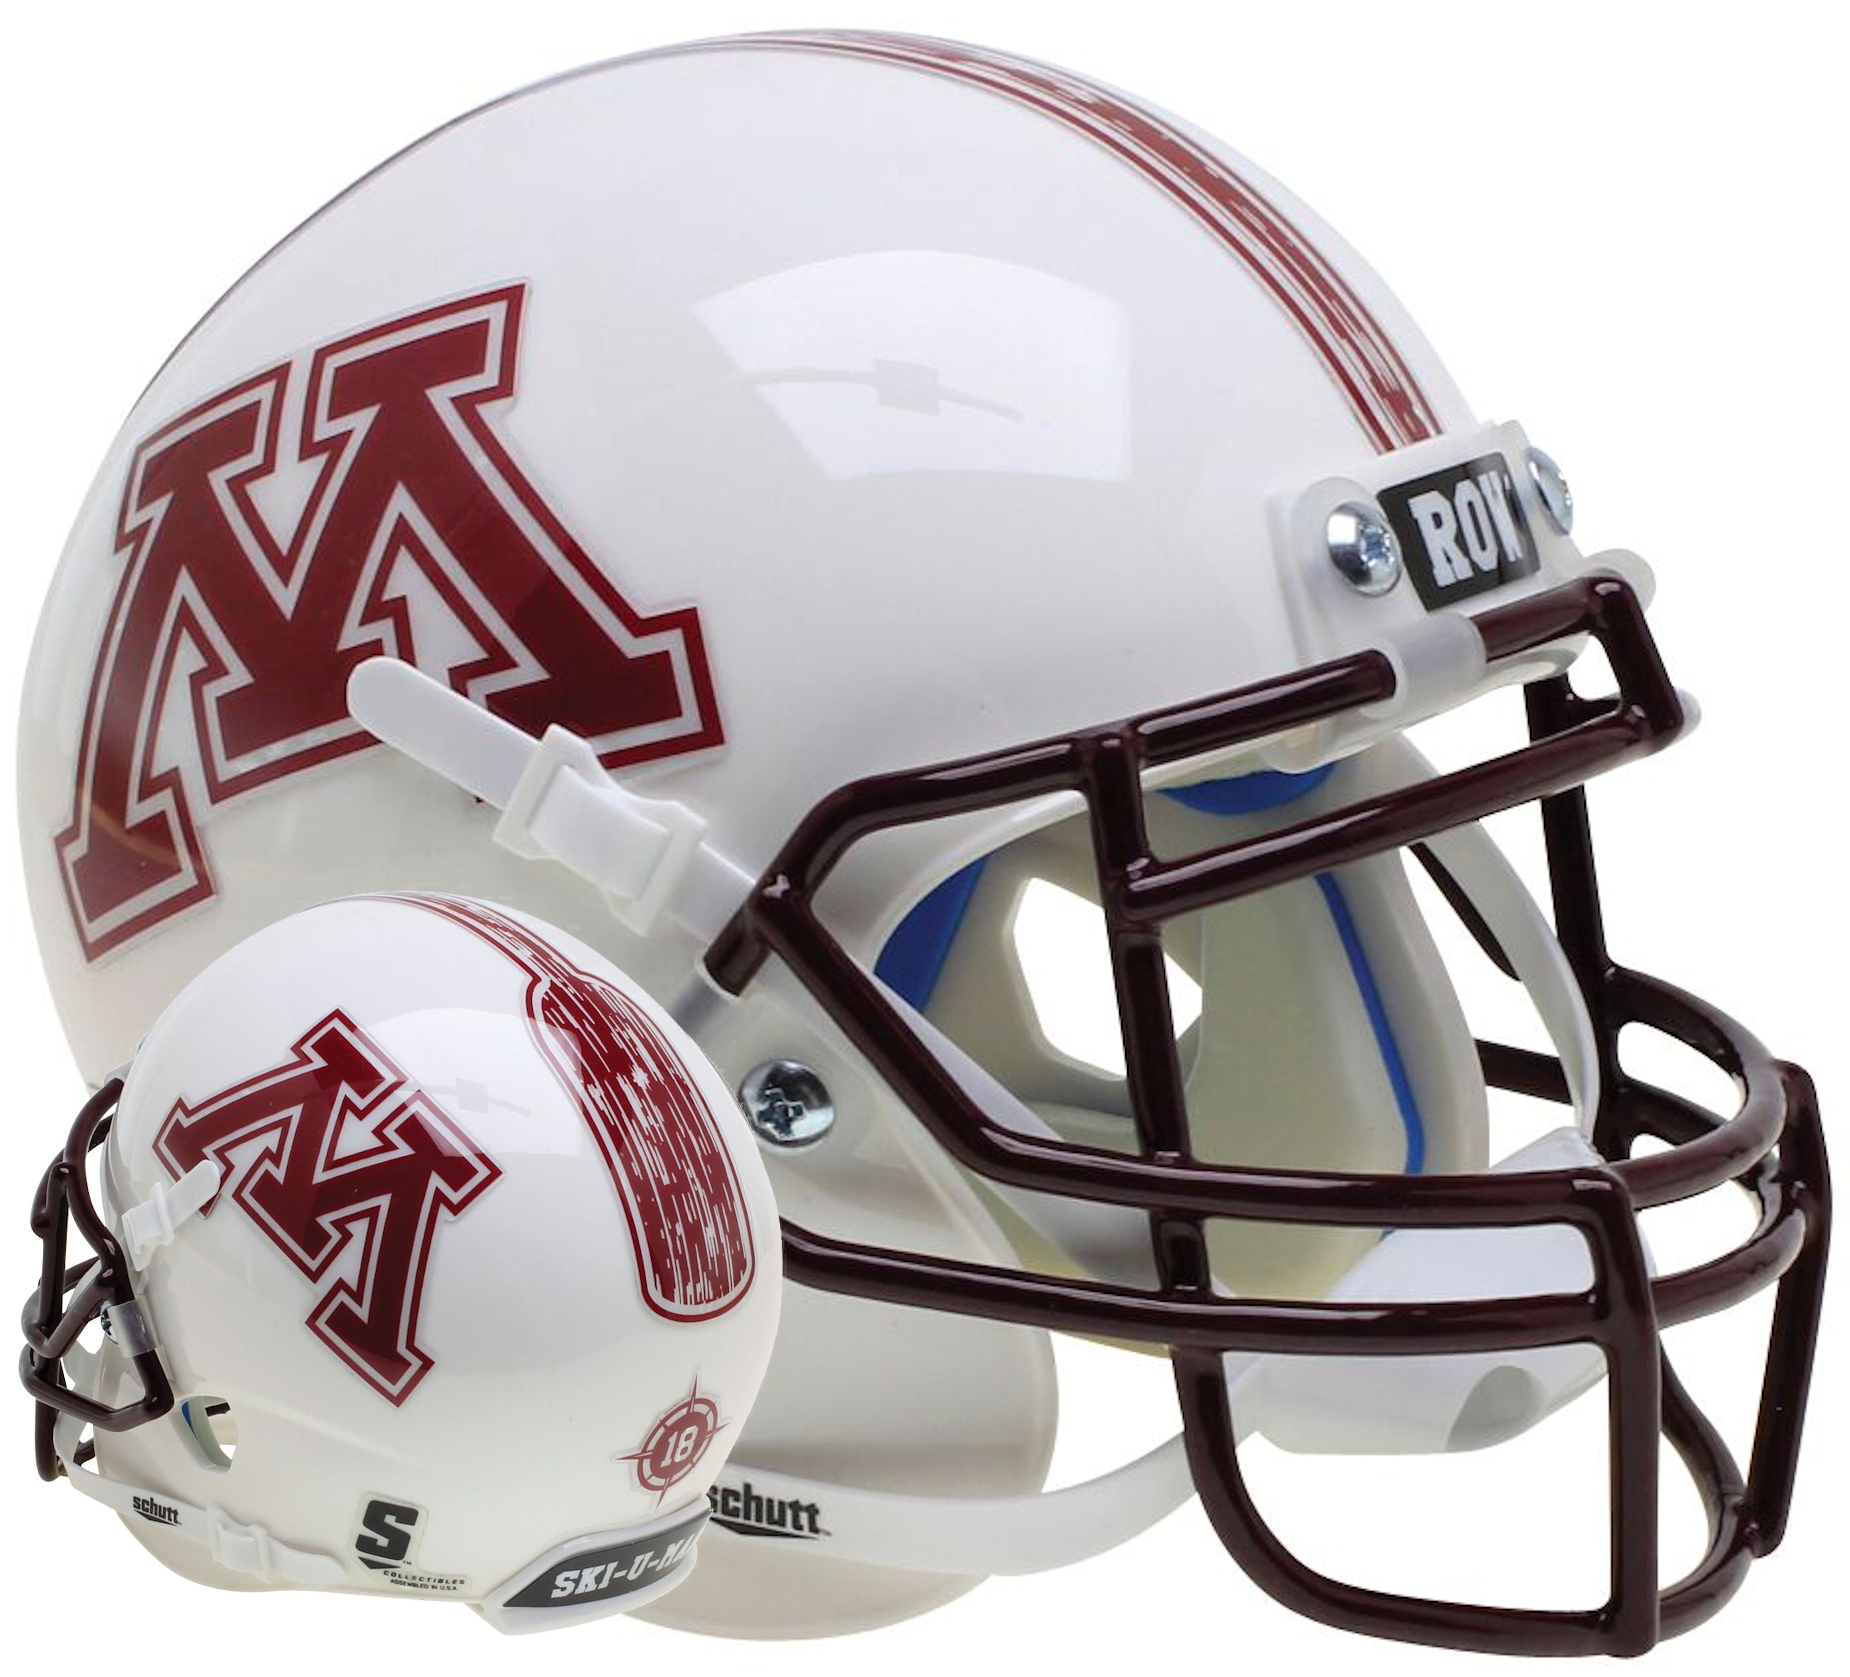 Minnesota Golden Gophers Full XP Replica Football Helmet Schutt <B>White Pinstripe</B>